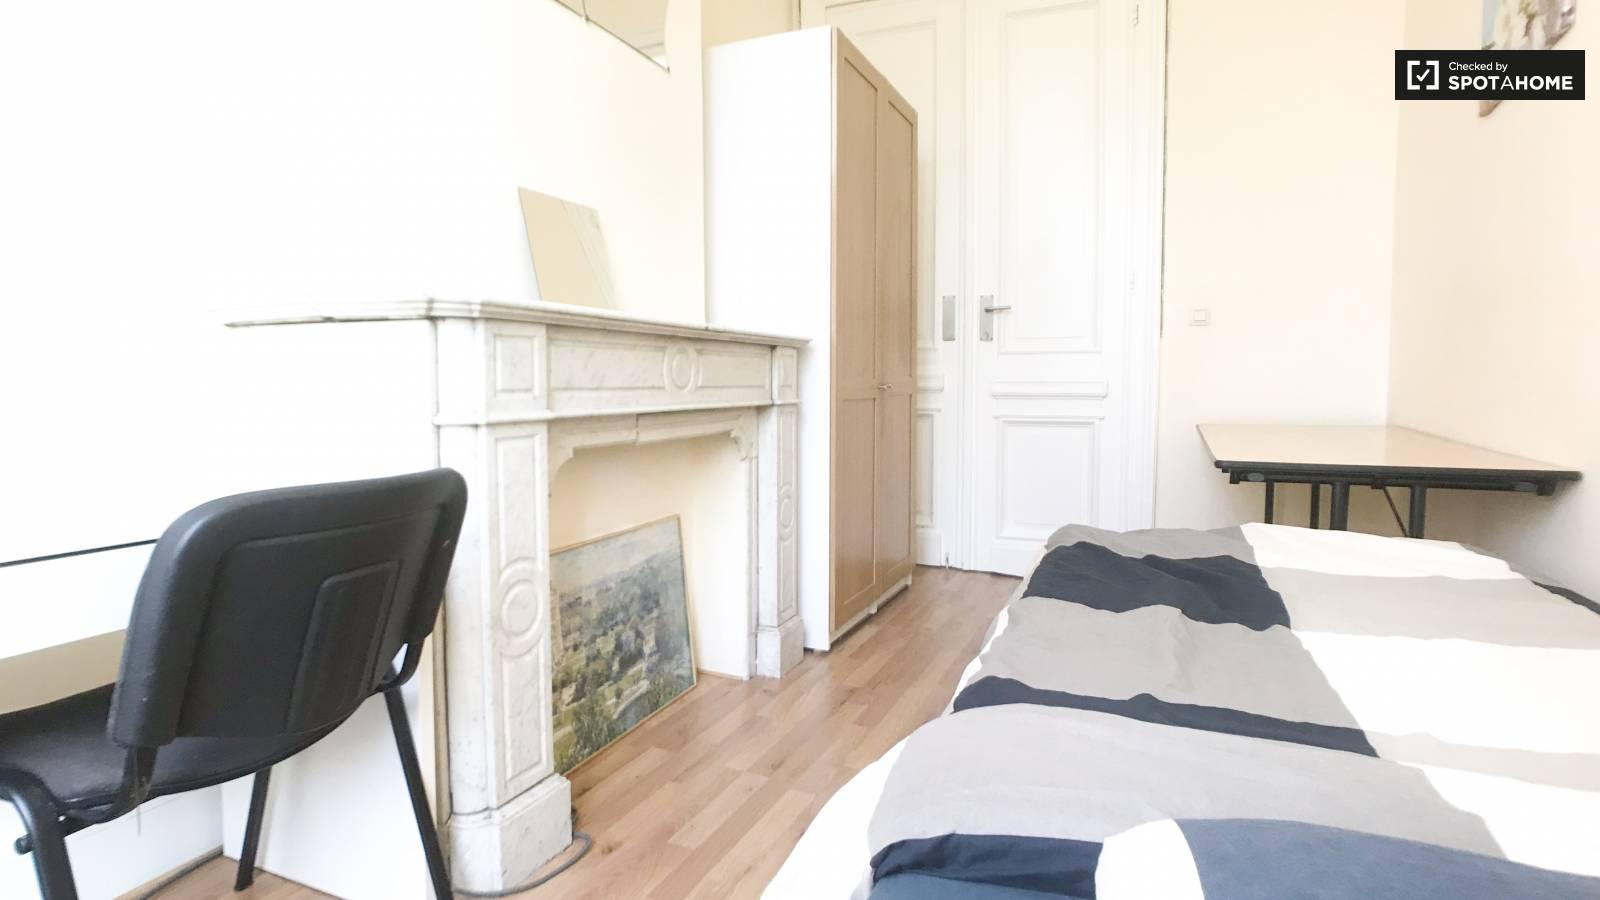 Bedroom A2